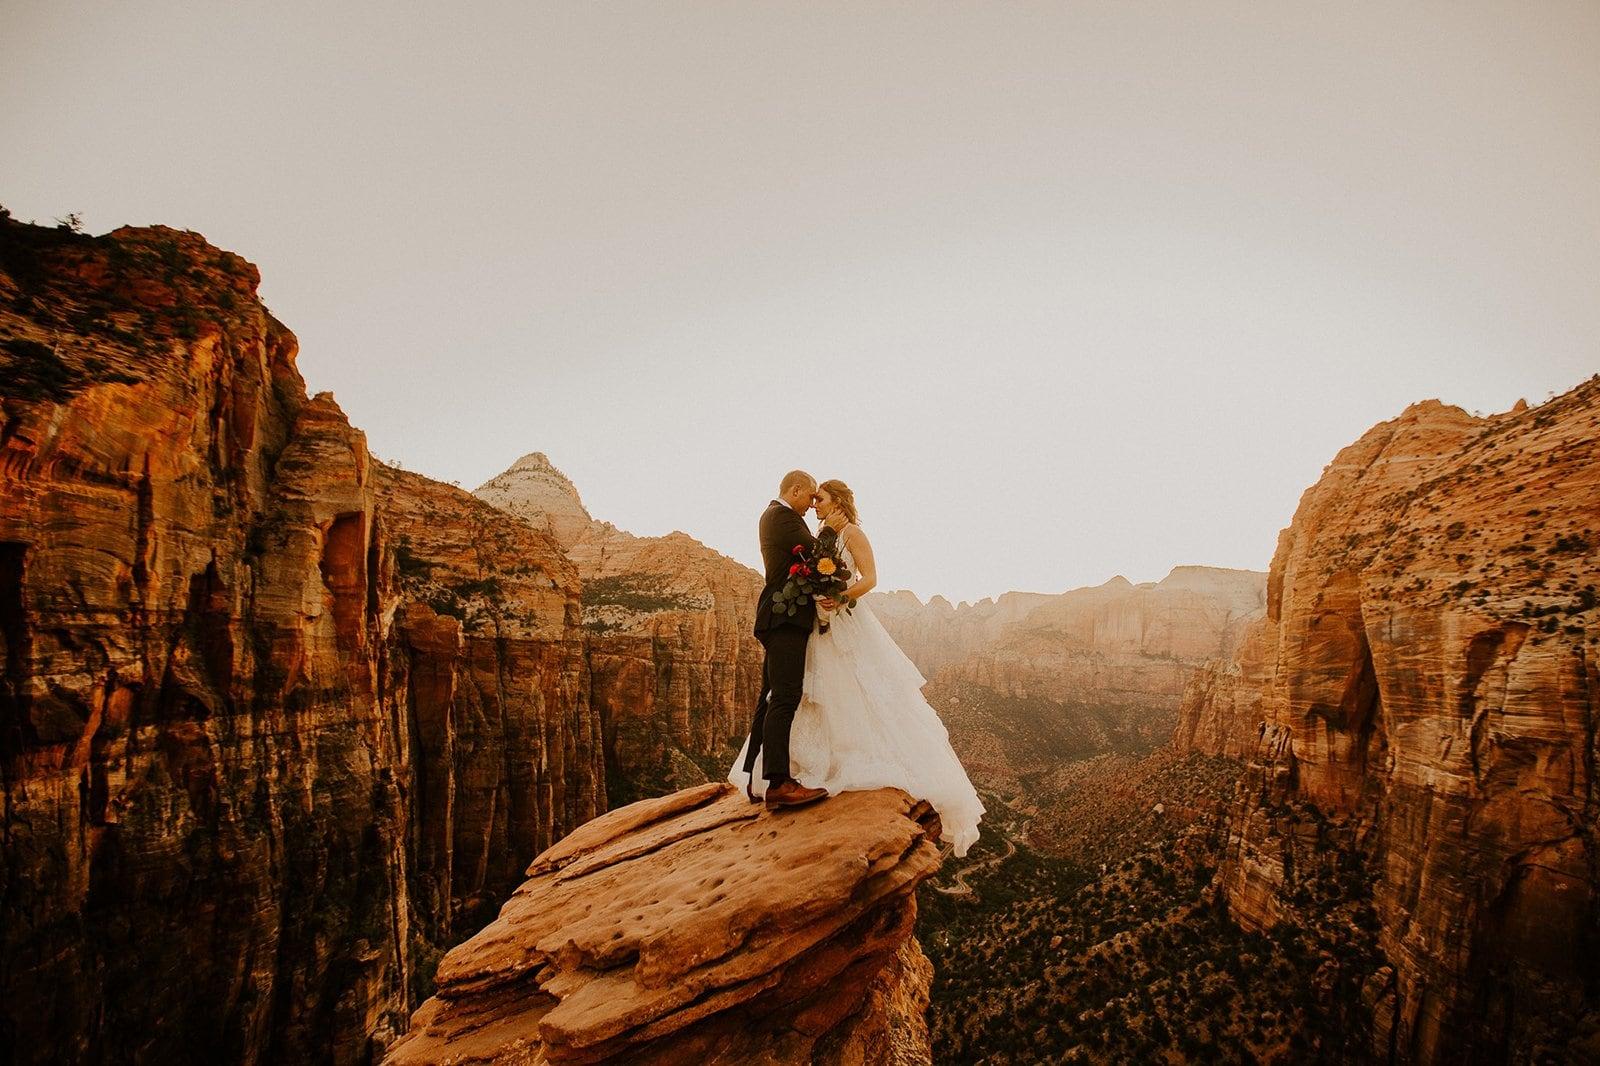 zion national park elopement photos on a rock